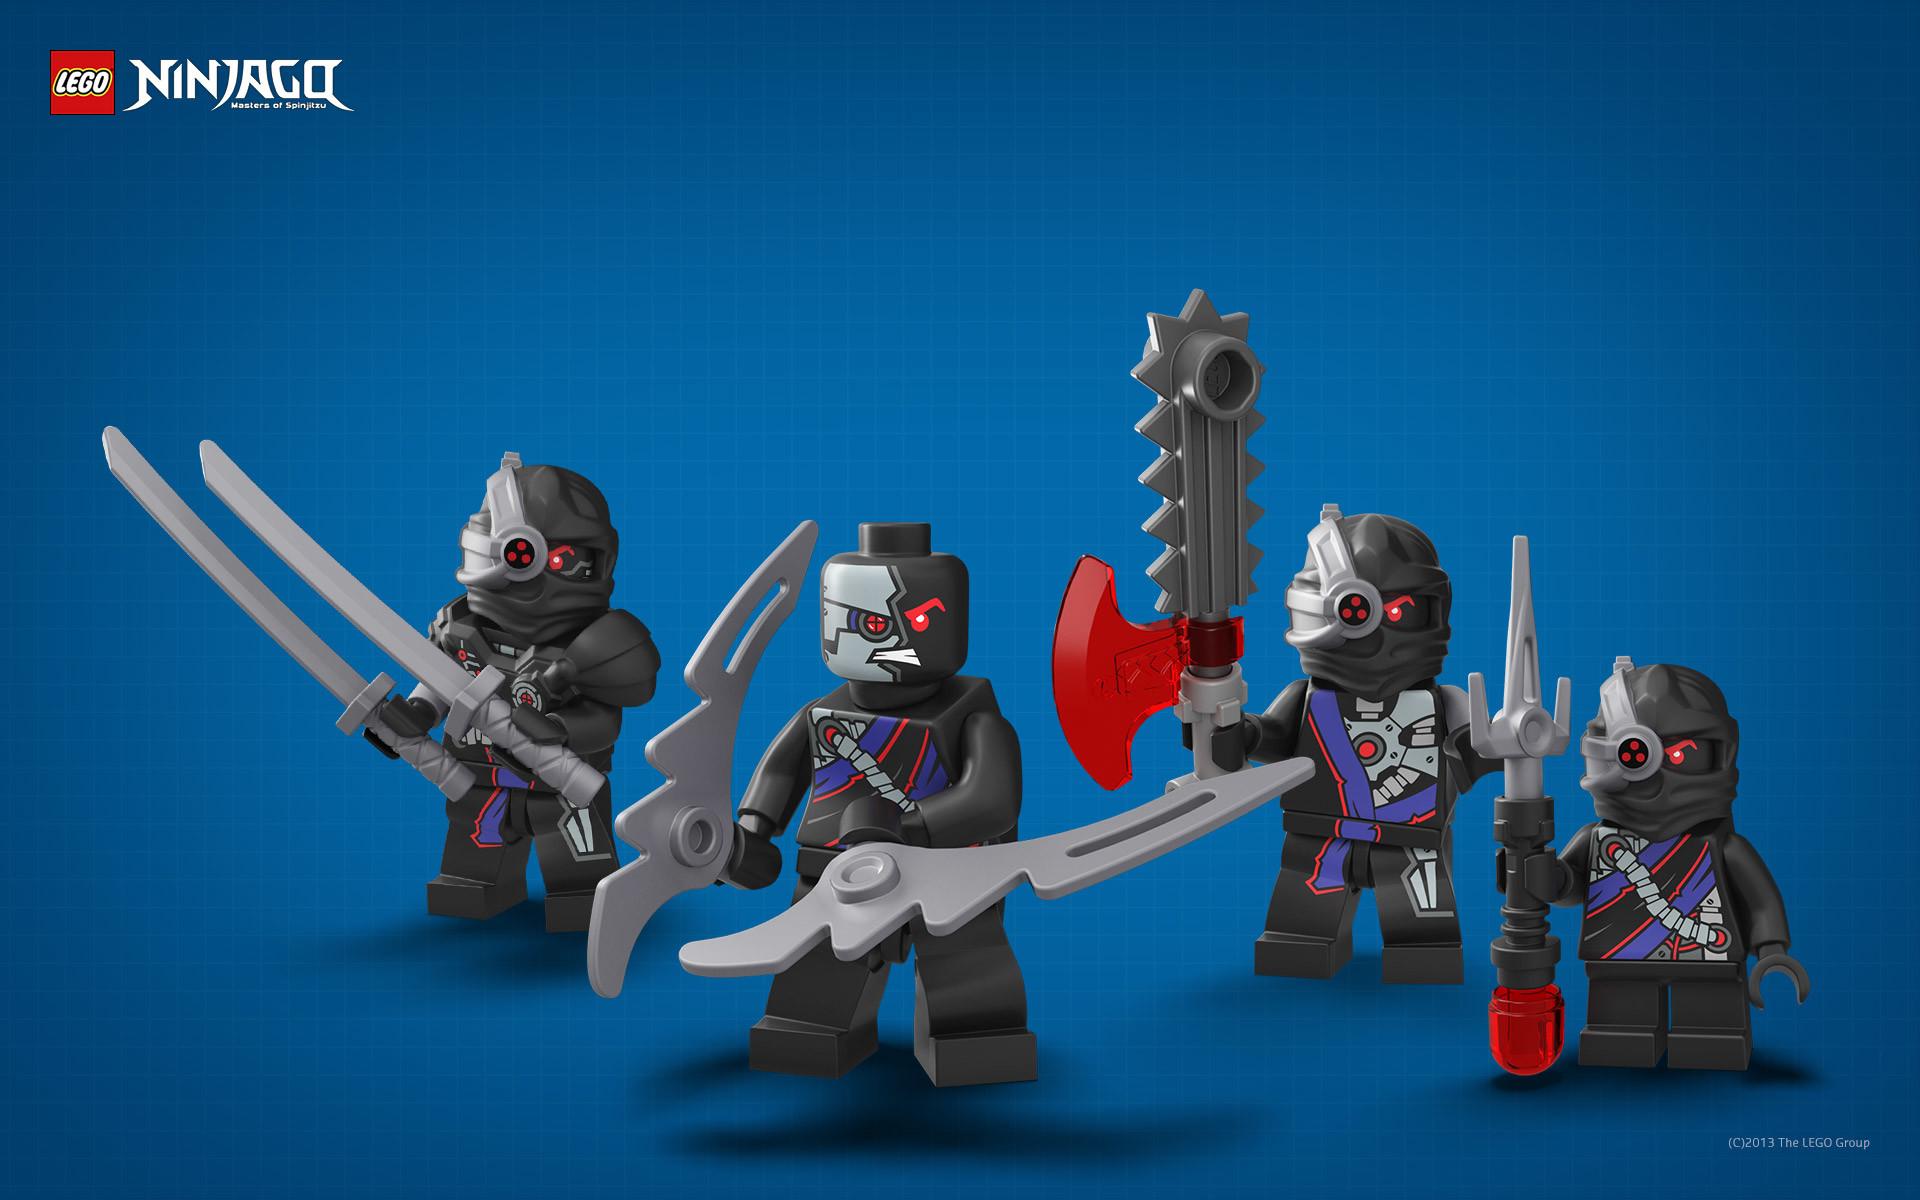 Wallpaper: LEGO Ninjago – Ninroids